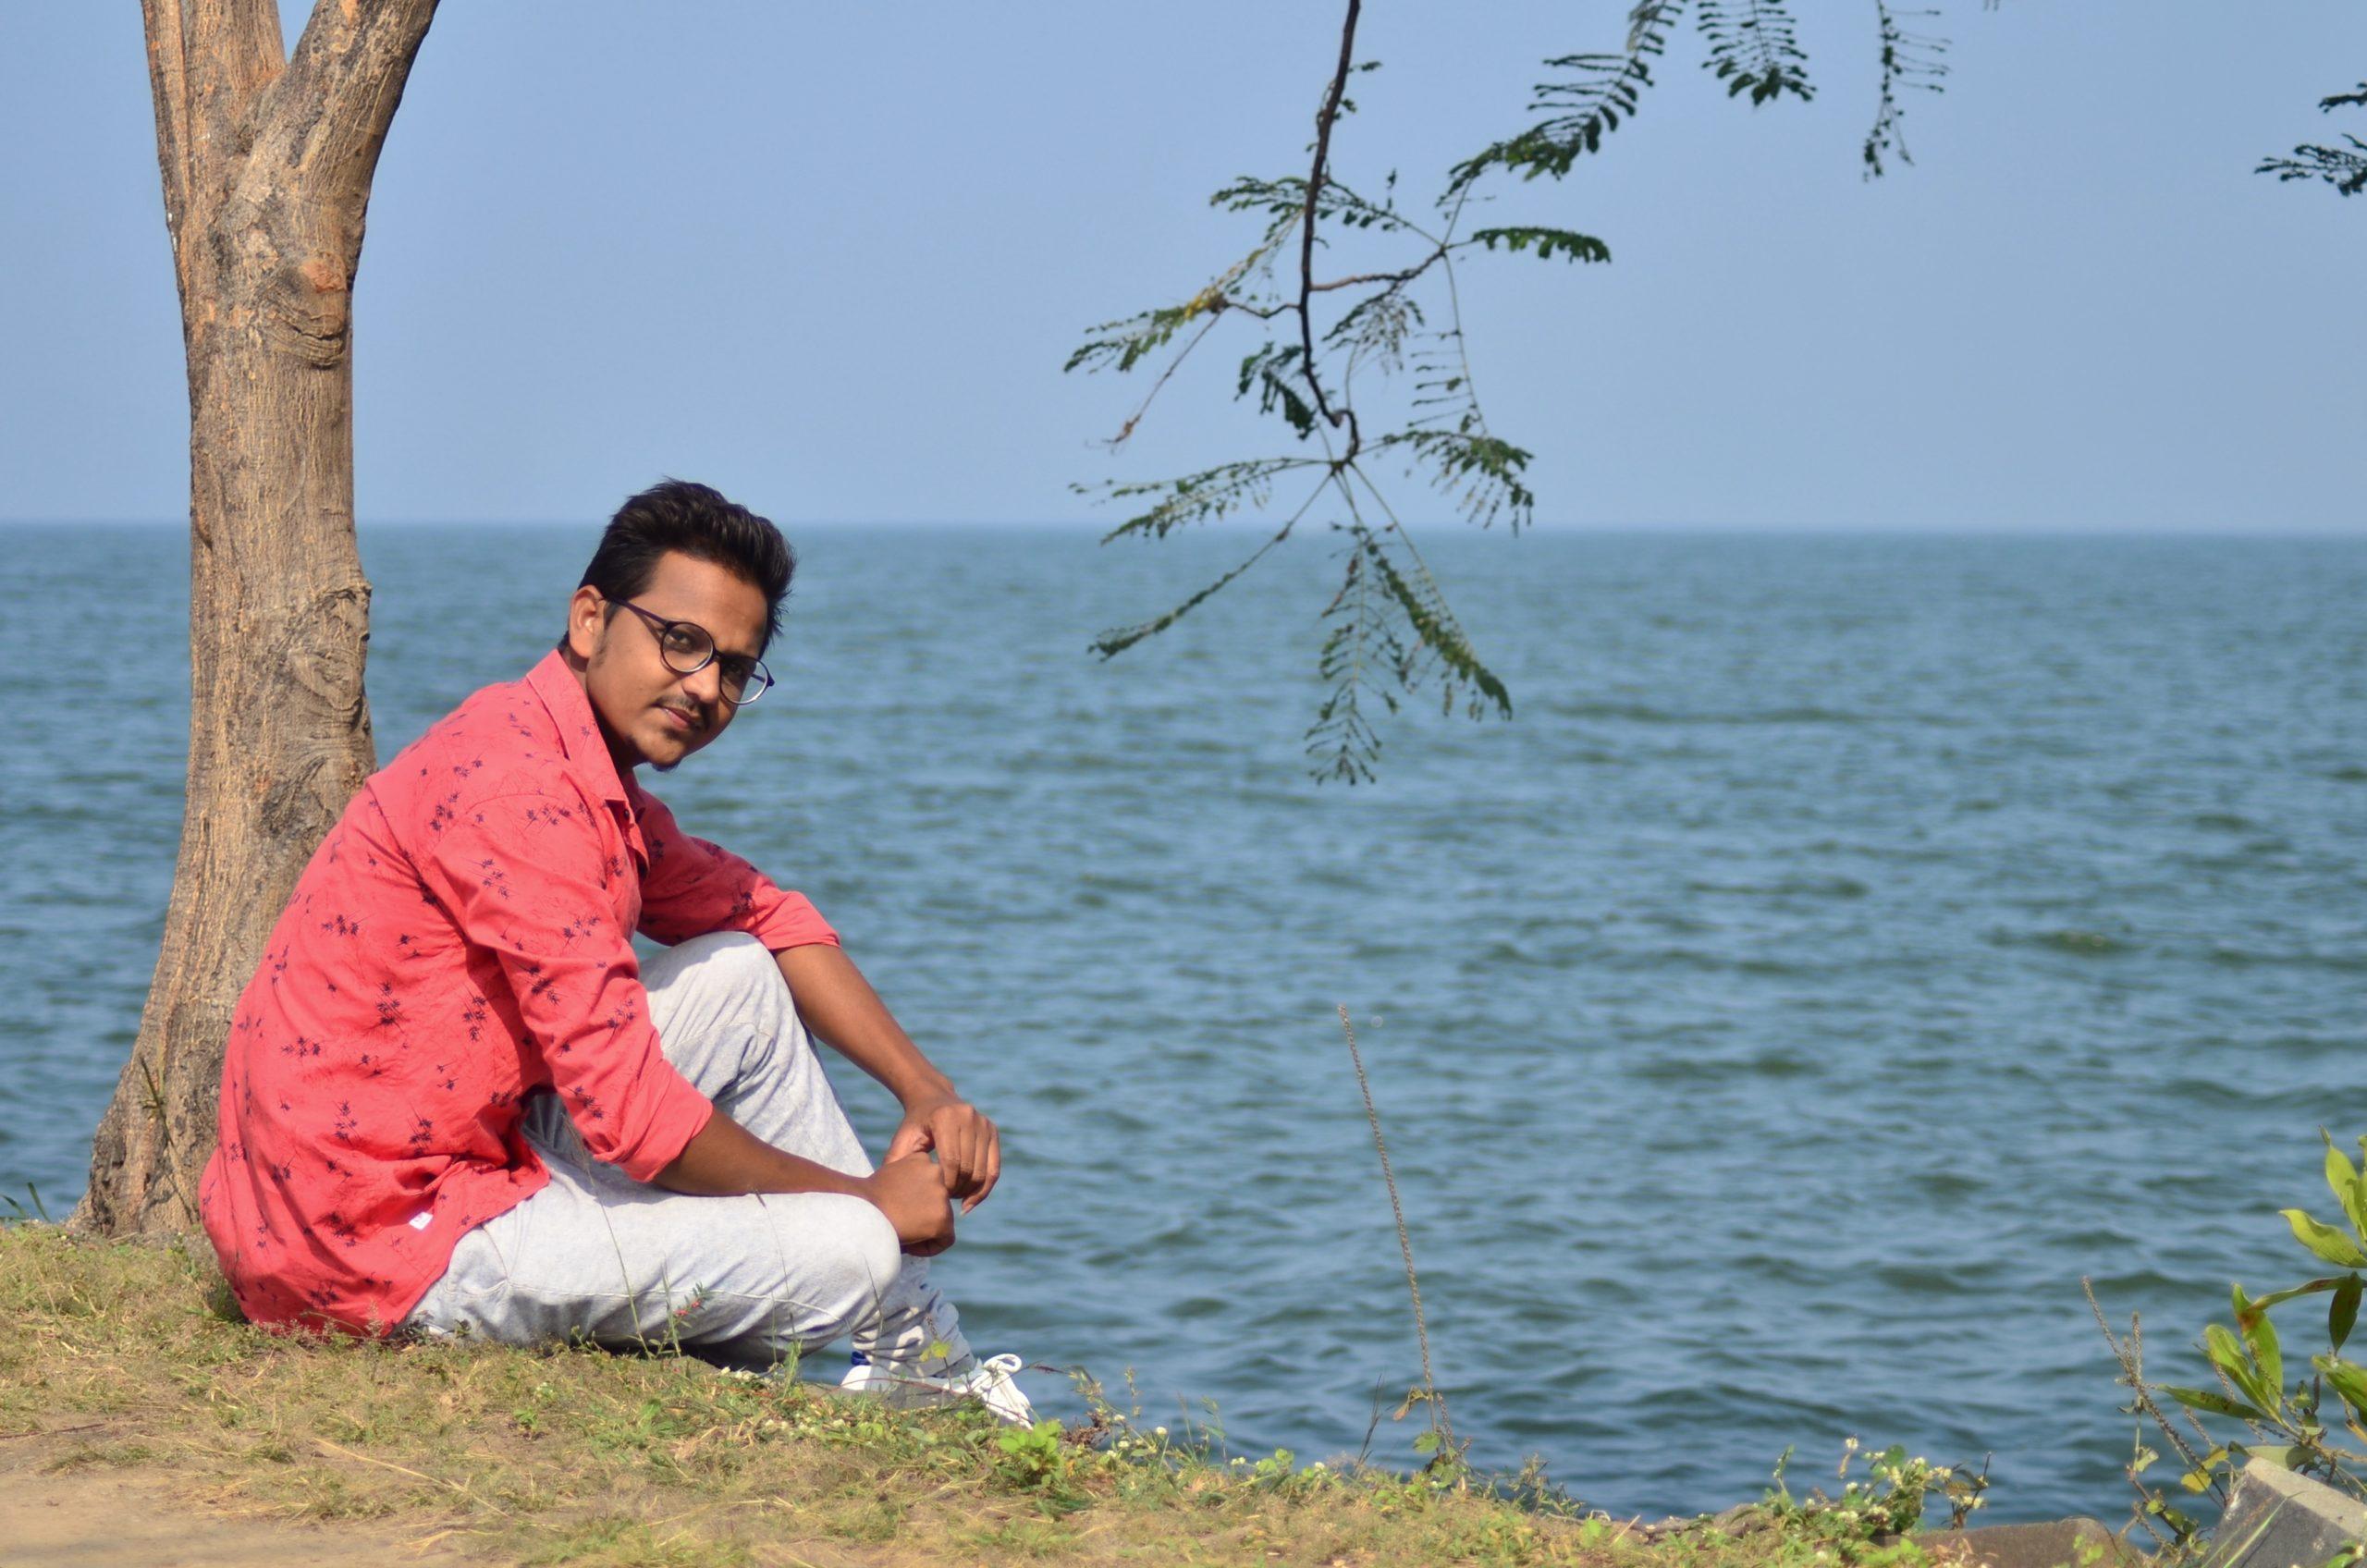 A boy at beachside